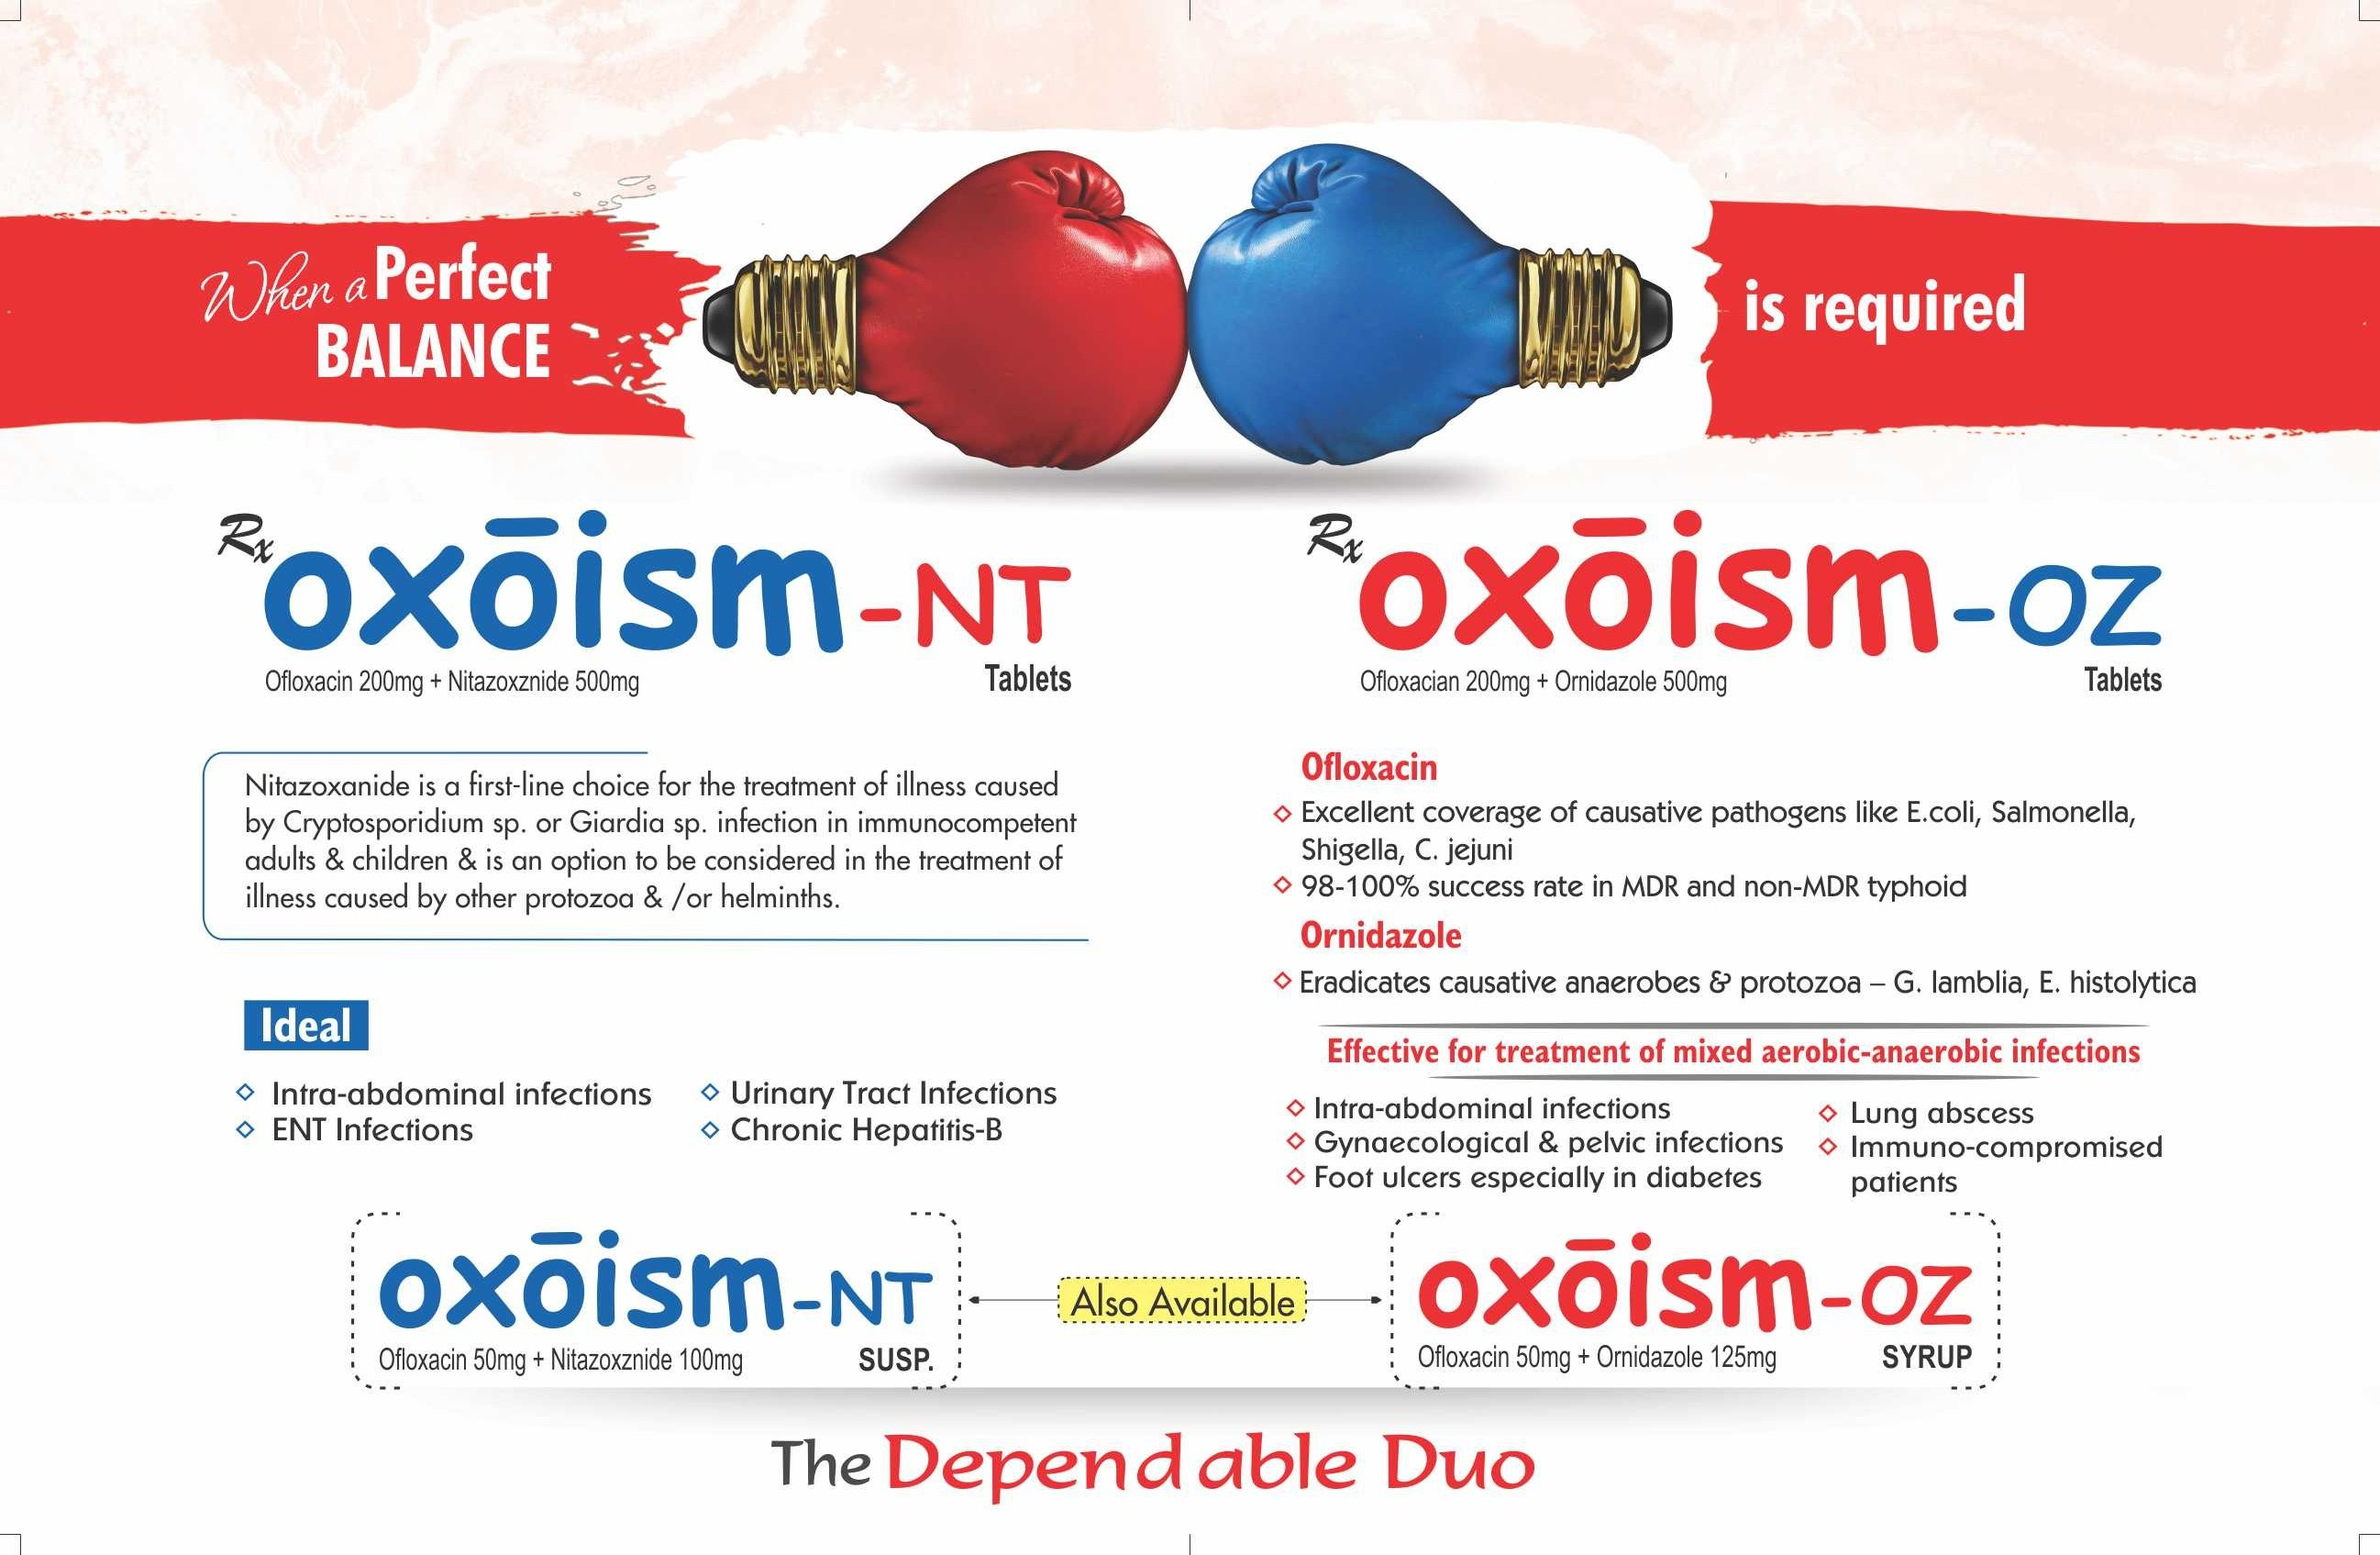 Oxoism-Oz-Nt